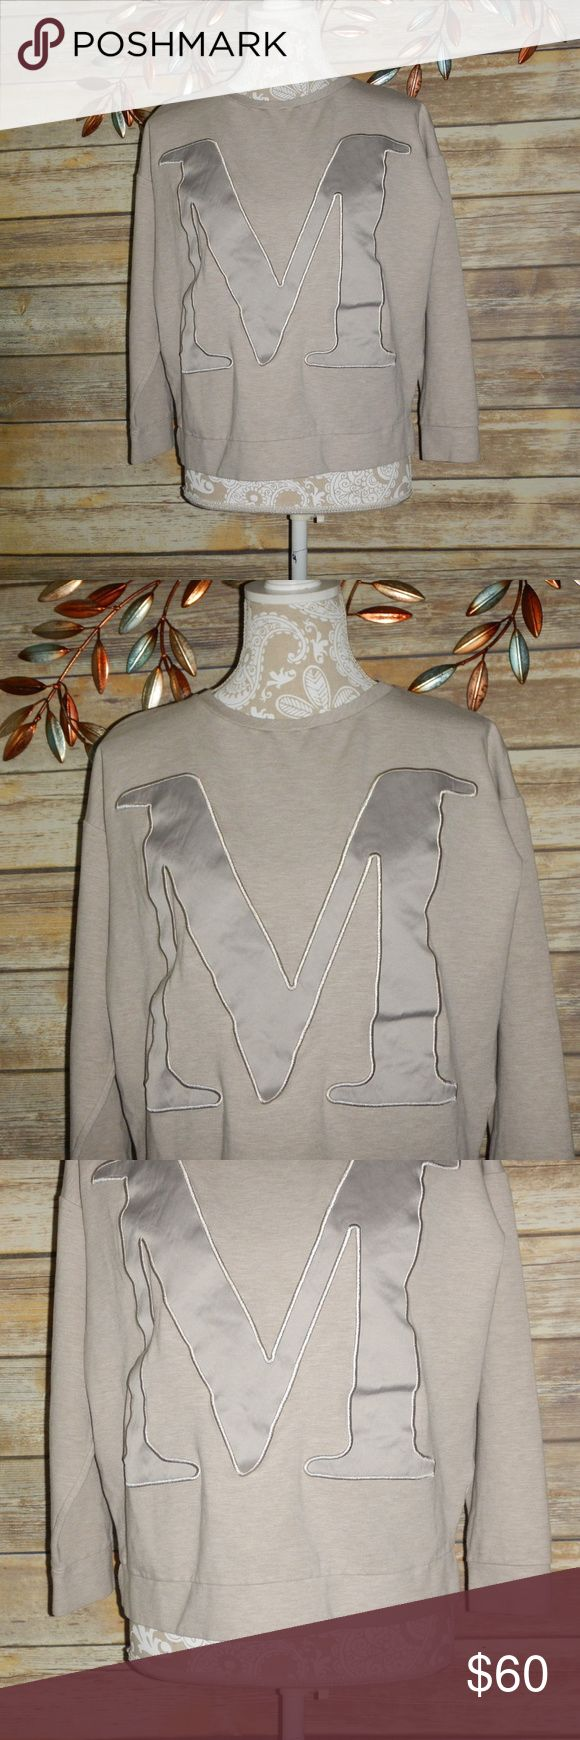 "Max Mara Logo Sweatshirt Max Mara Womens Beige Logo Sweatshirt Long Sleeve Size Large Please note size tag is missing based on measurements estimated size Large. Chest: 23"" flat  Length: 21"" MaxMara Tops Sweatshirts & Hoodies"